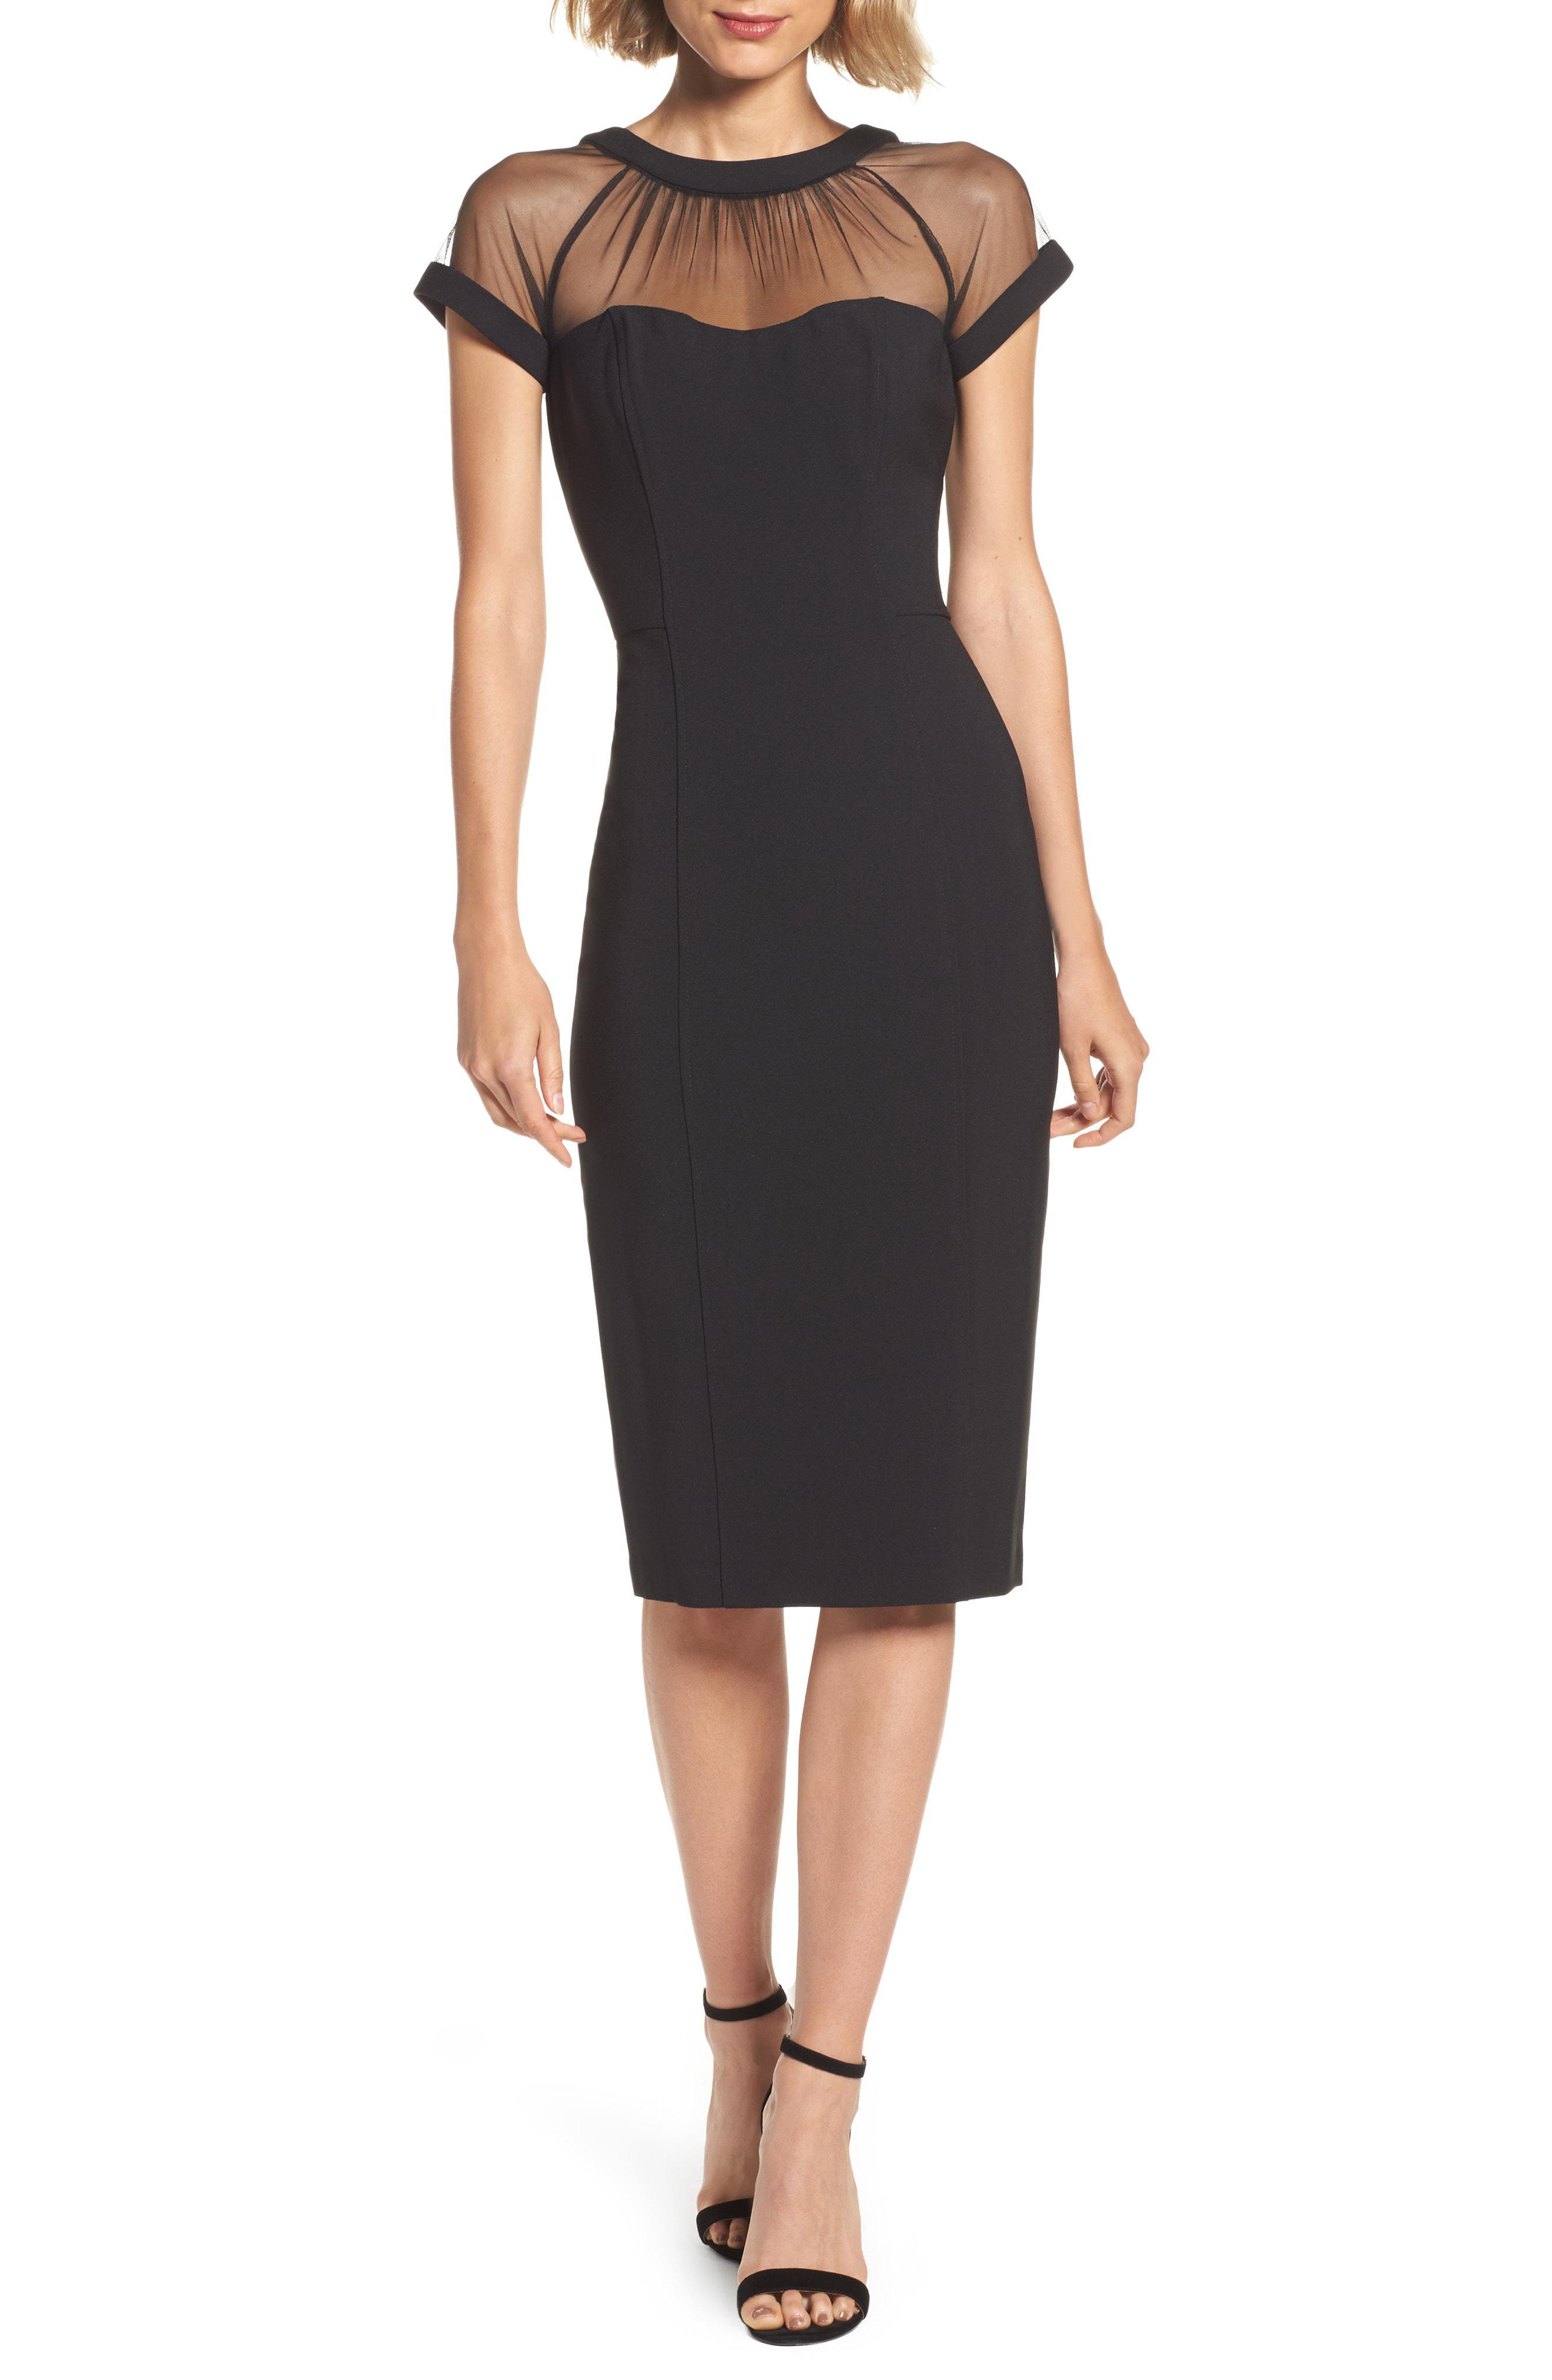 41a83923 Lyst - Maggy London Illusion Yoke Crepe Sheath Dress in Black